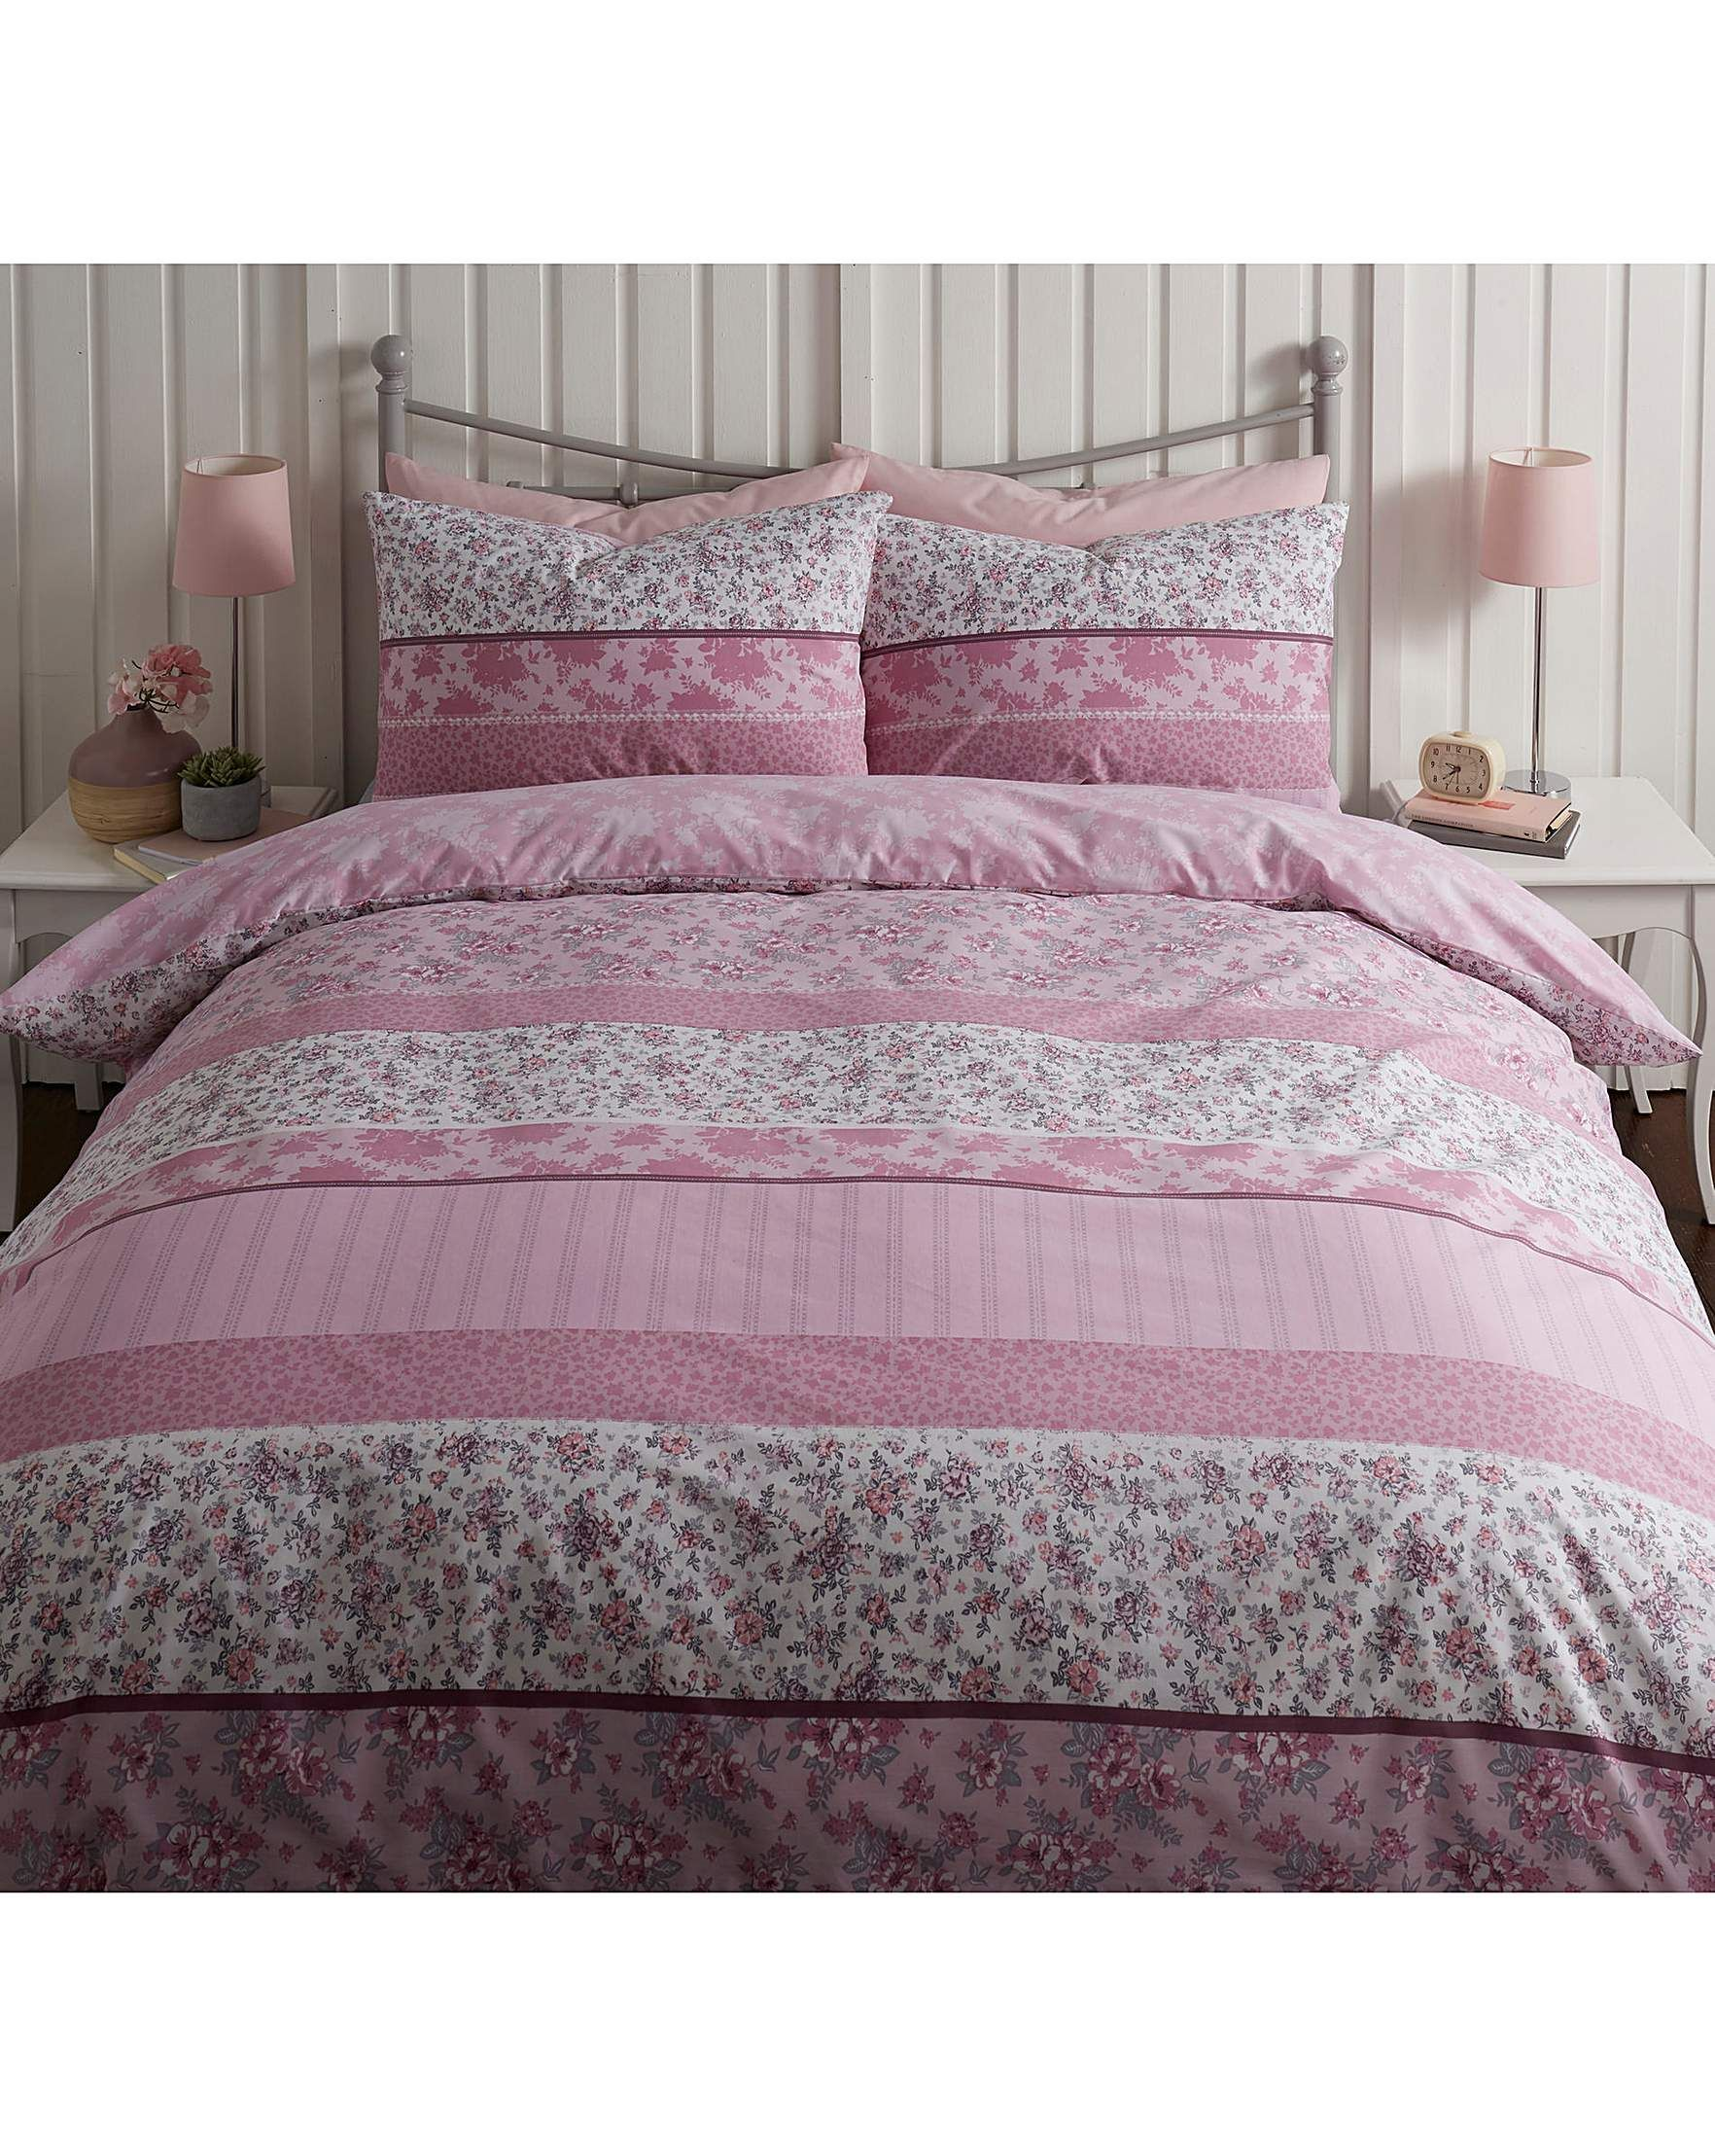 Zoe Printed Duvet Cover Set J D Williams Duvet Cover Sets Bed Design Duvet Covers